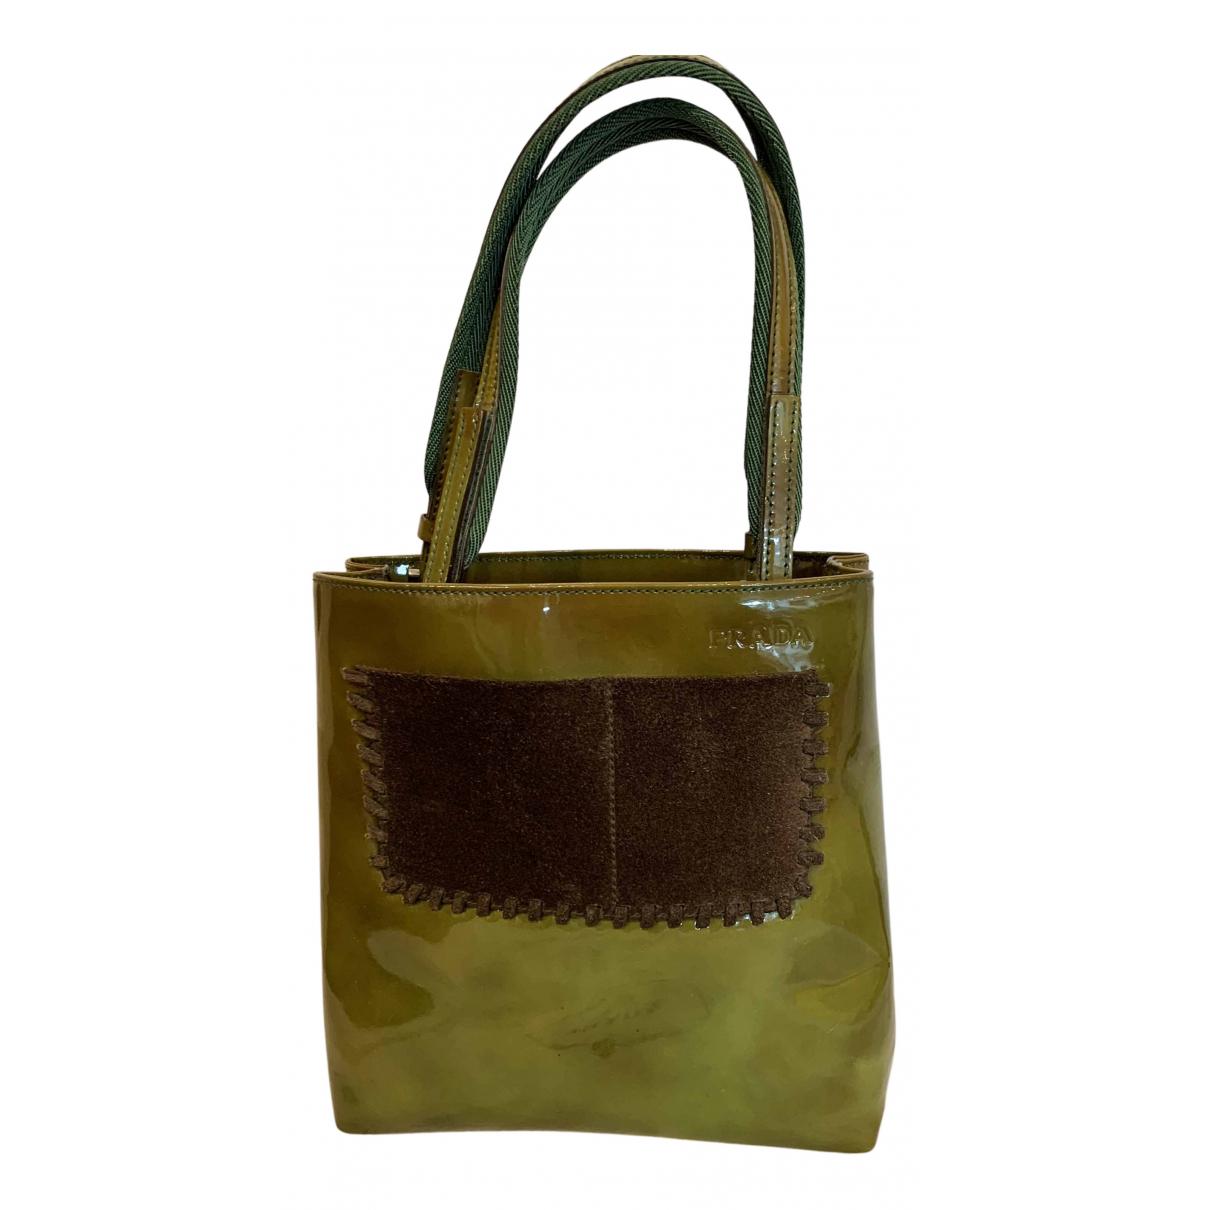 Prada N Green Patent leather handbag for Women N